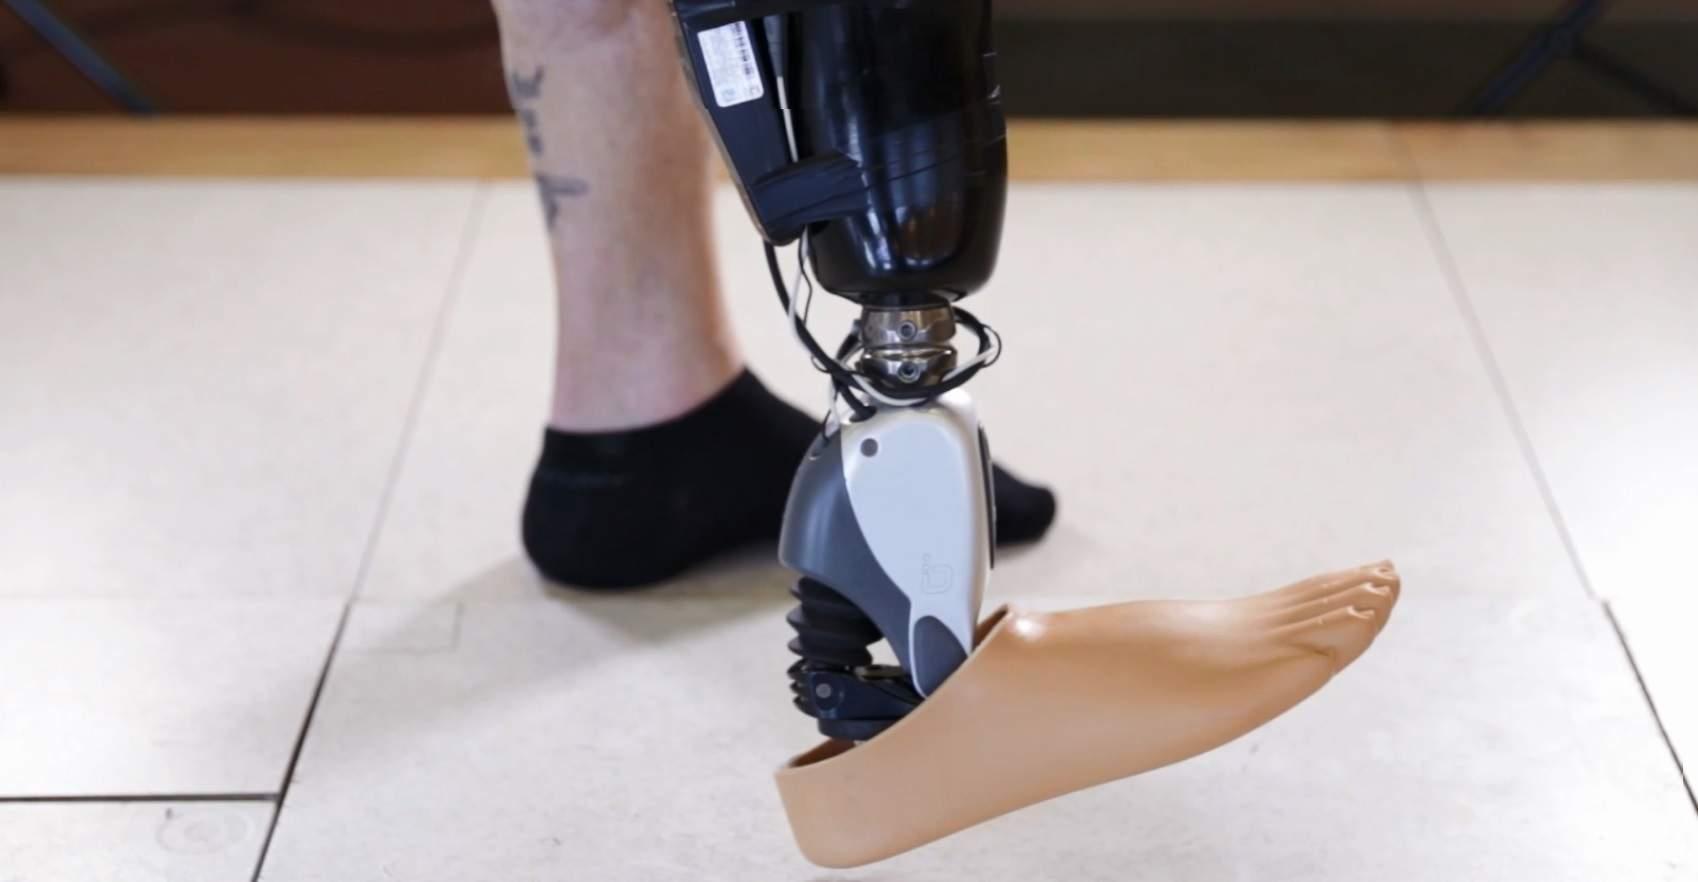 Ossur's Proprio Foot